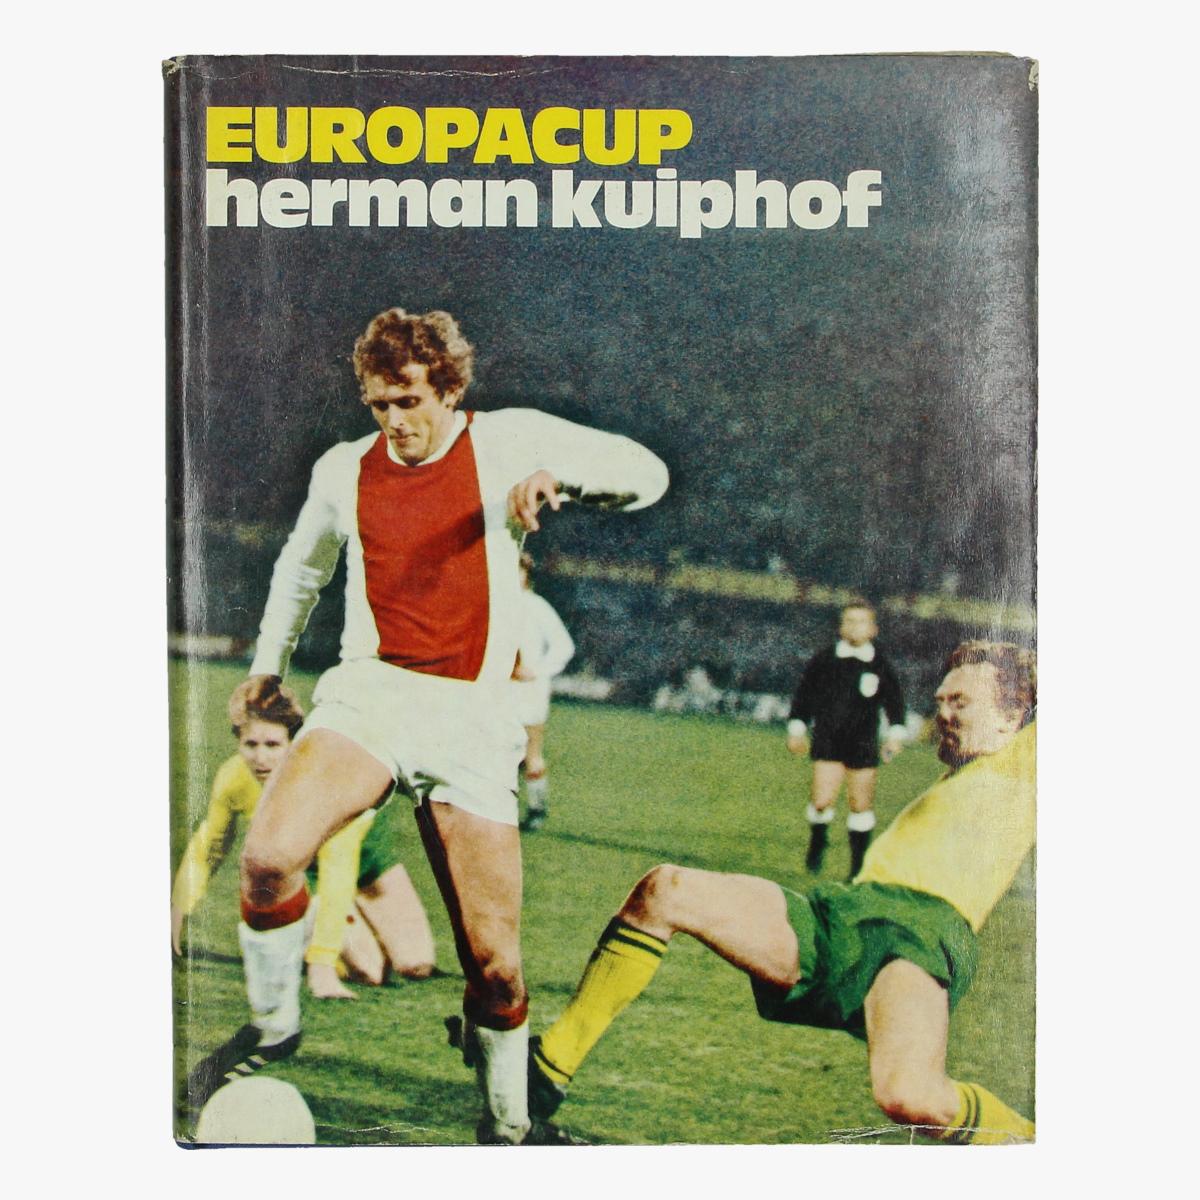 Afbeeldingen van boek voetbal europacup herman kuiphof 1970/71 uitgeverij luitingh - laren n.h